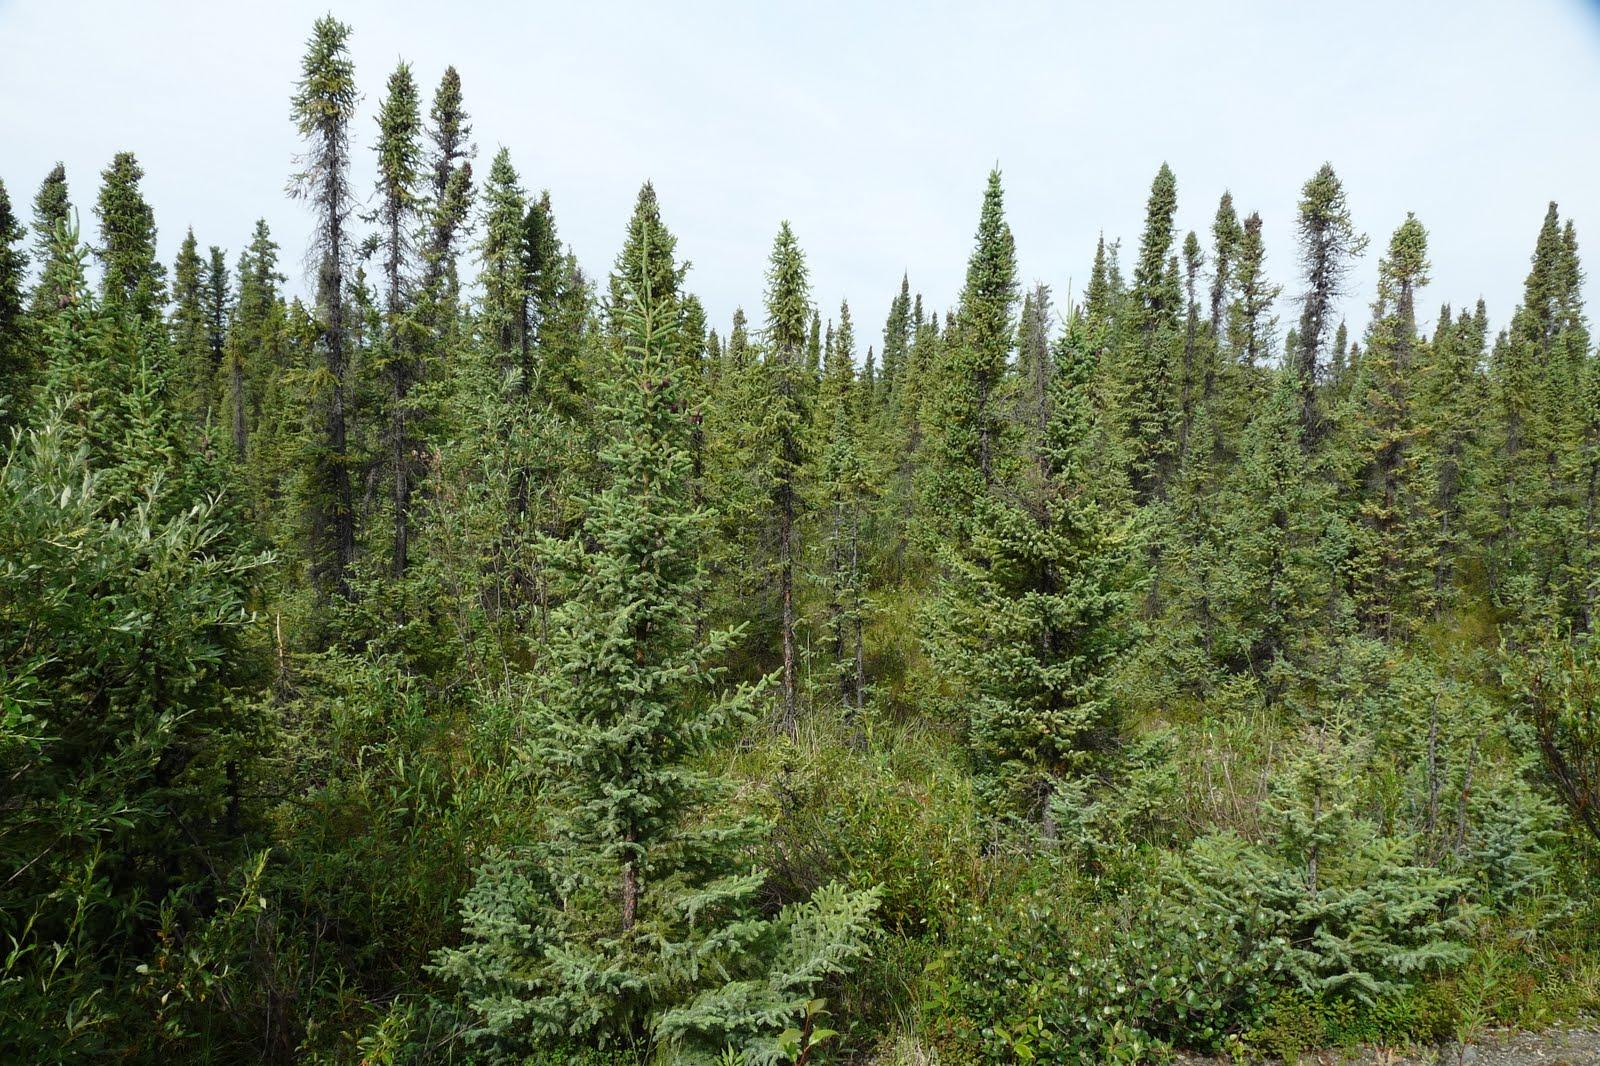 trees summer alaska - photo #15